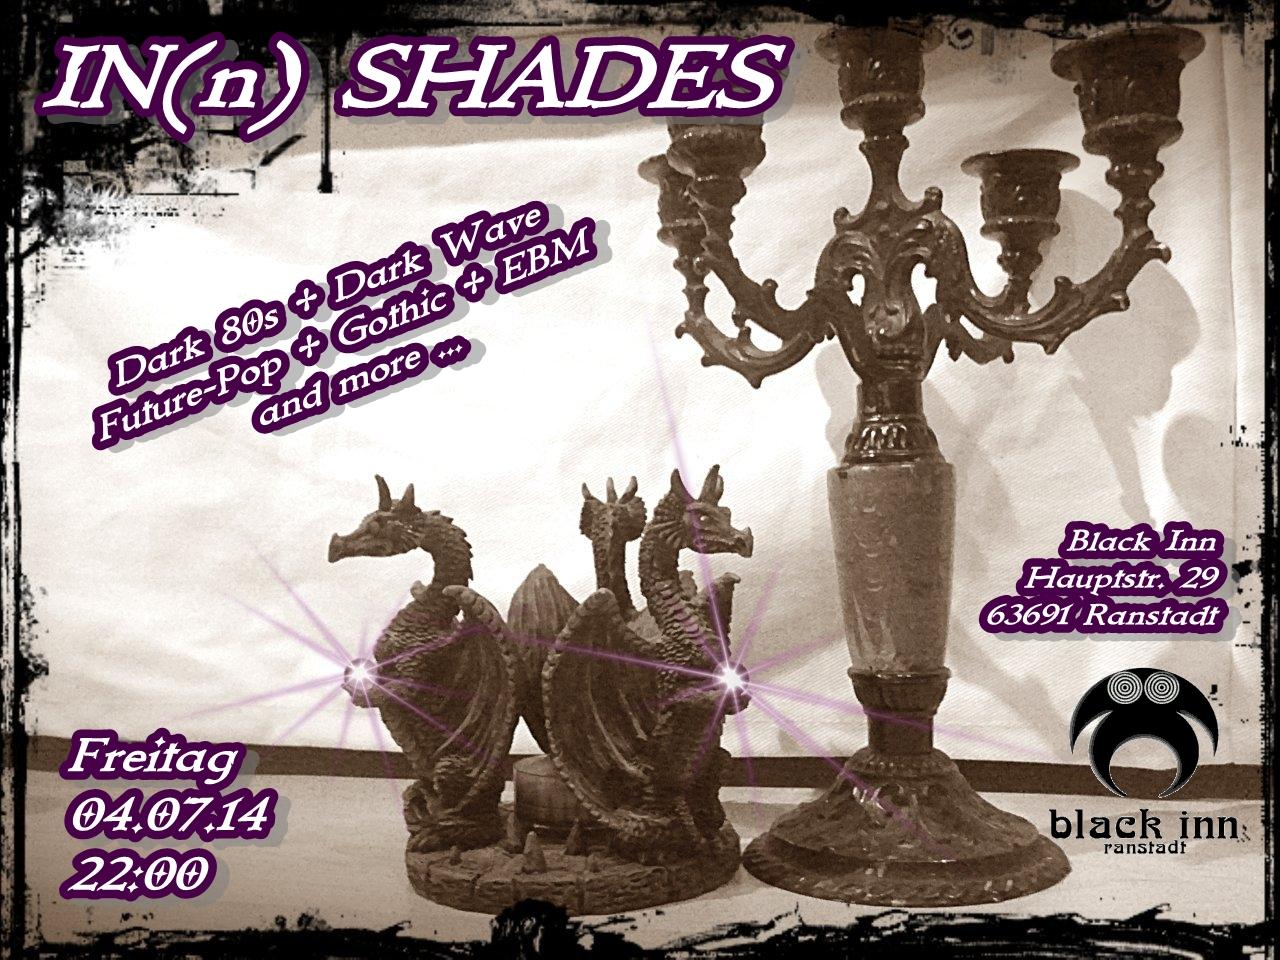 IN(n)SHADES_040714_Flyer